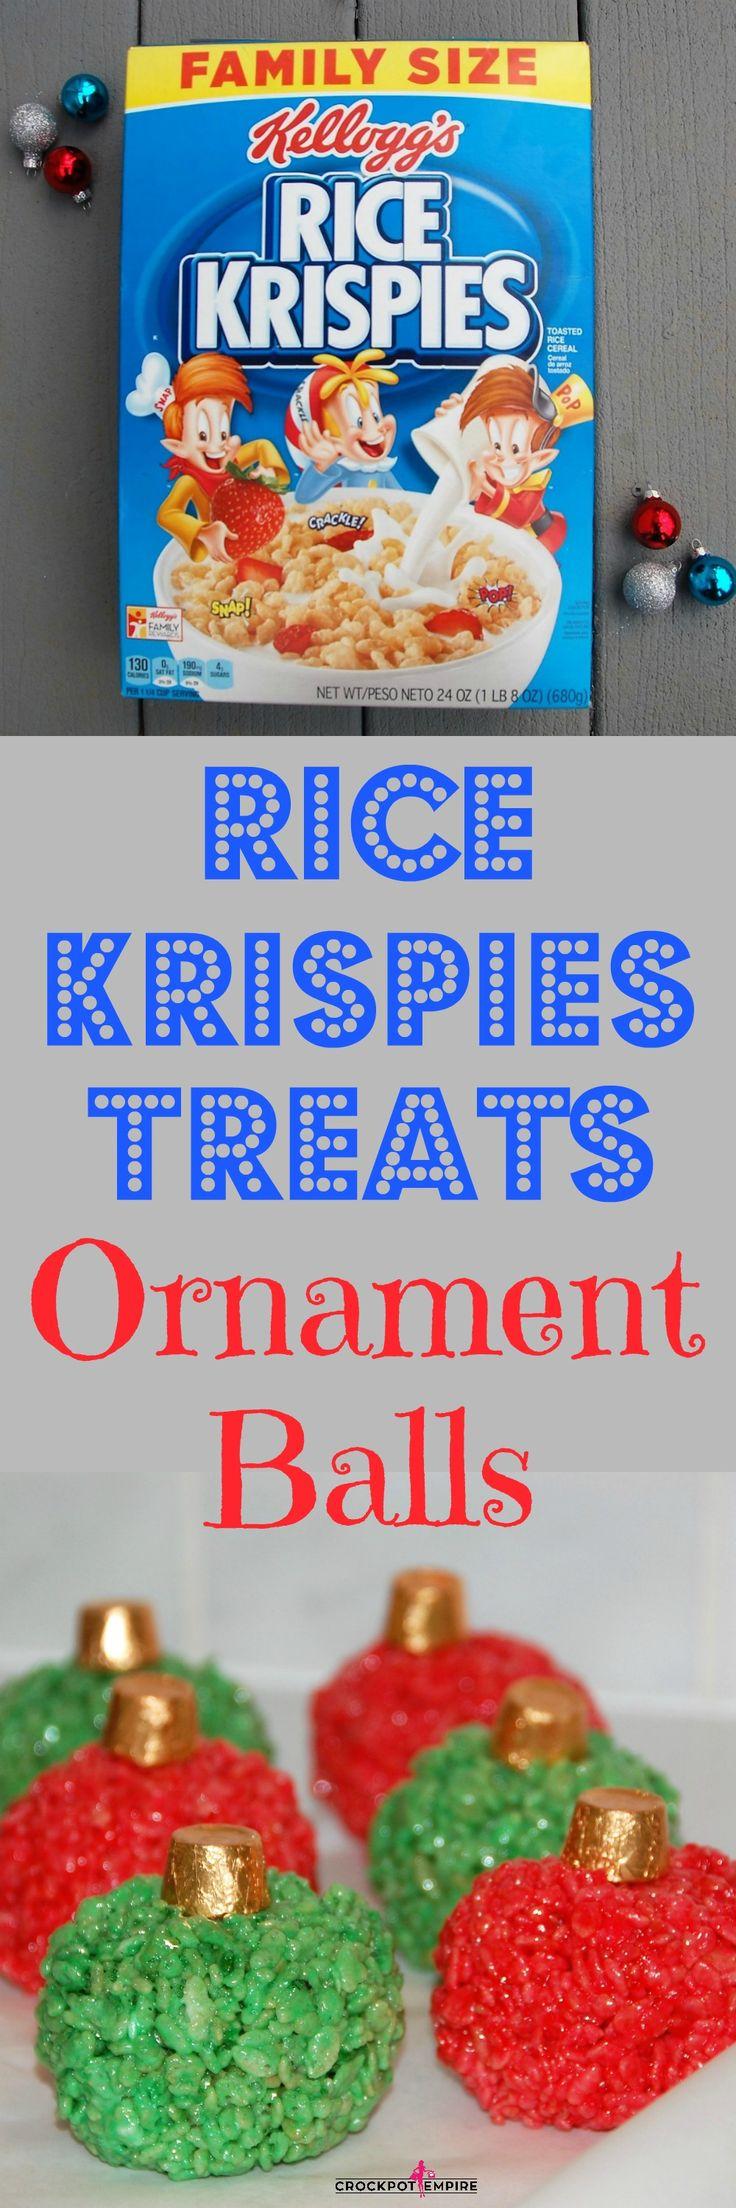 Rice Krispies Treats Ornament Balls #HolidayTreatMaking #Ad